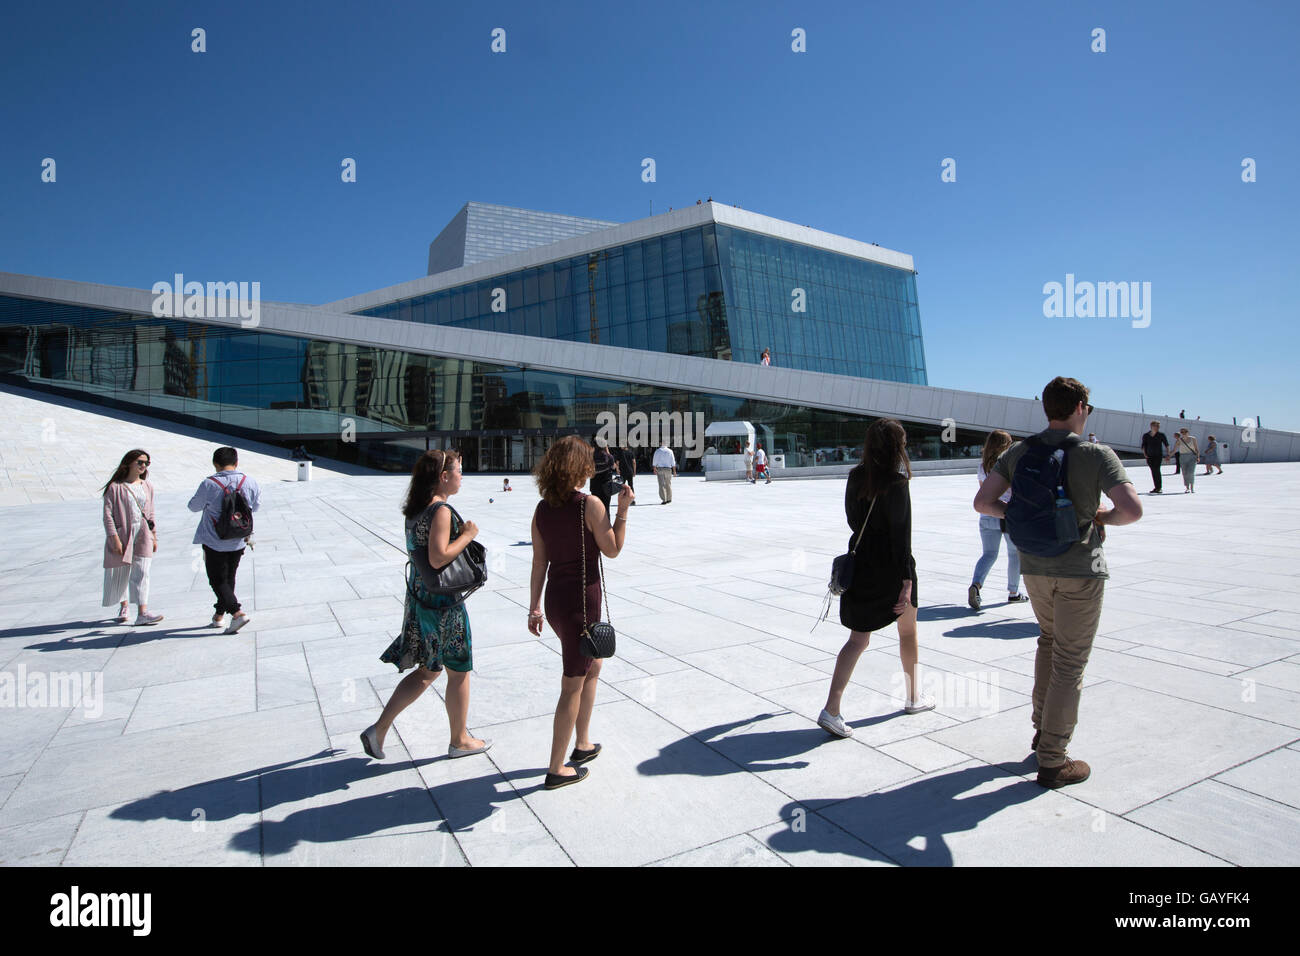 Oslo Opera House, home of The Norwegian National Opera and Ballet, and the national opera theatre in Norway, Bjørvika - Stock Image